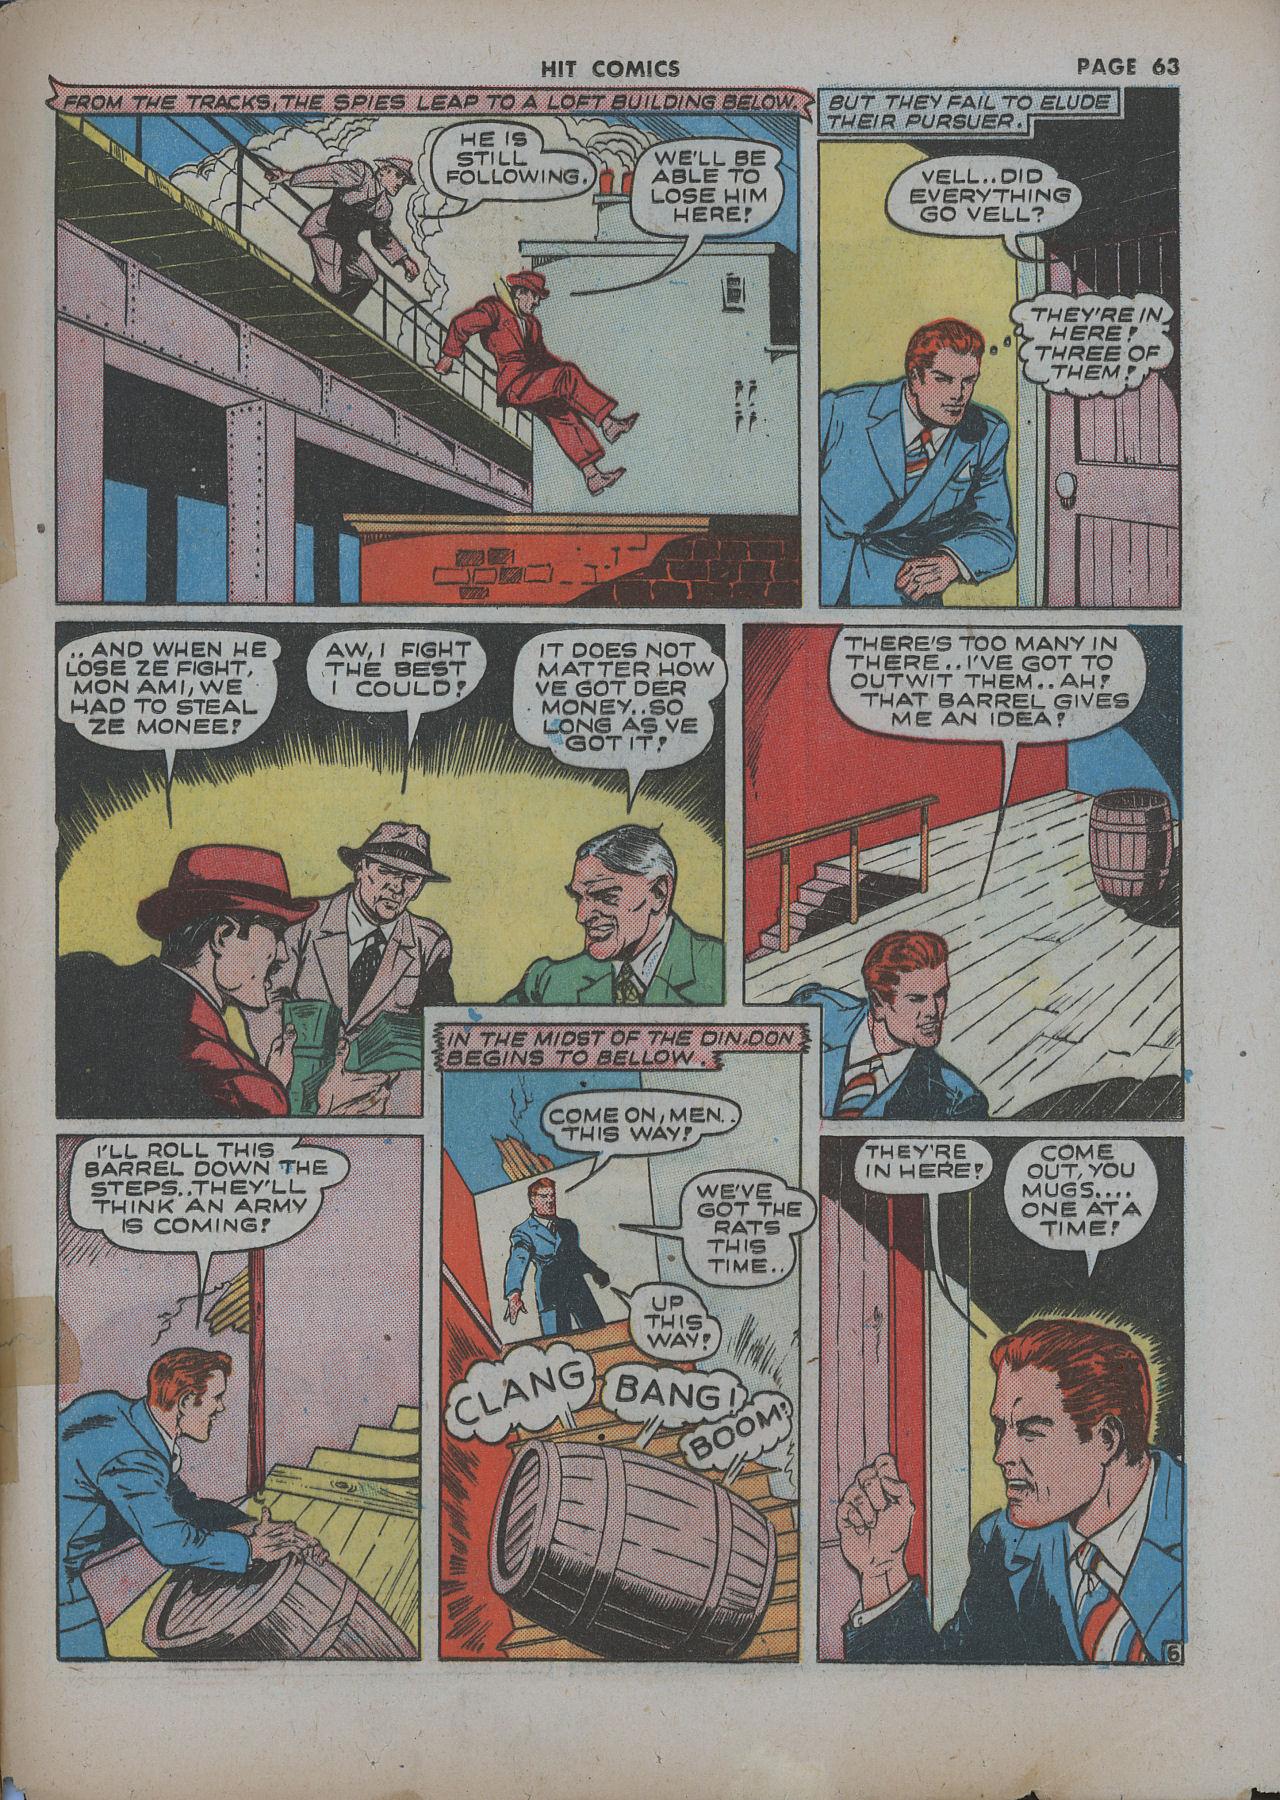 Read online Hit Comics comic -  Issue #22 - 65